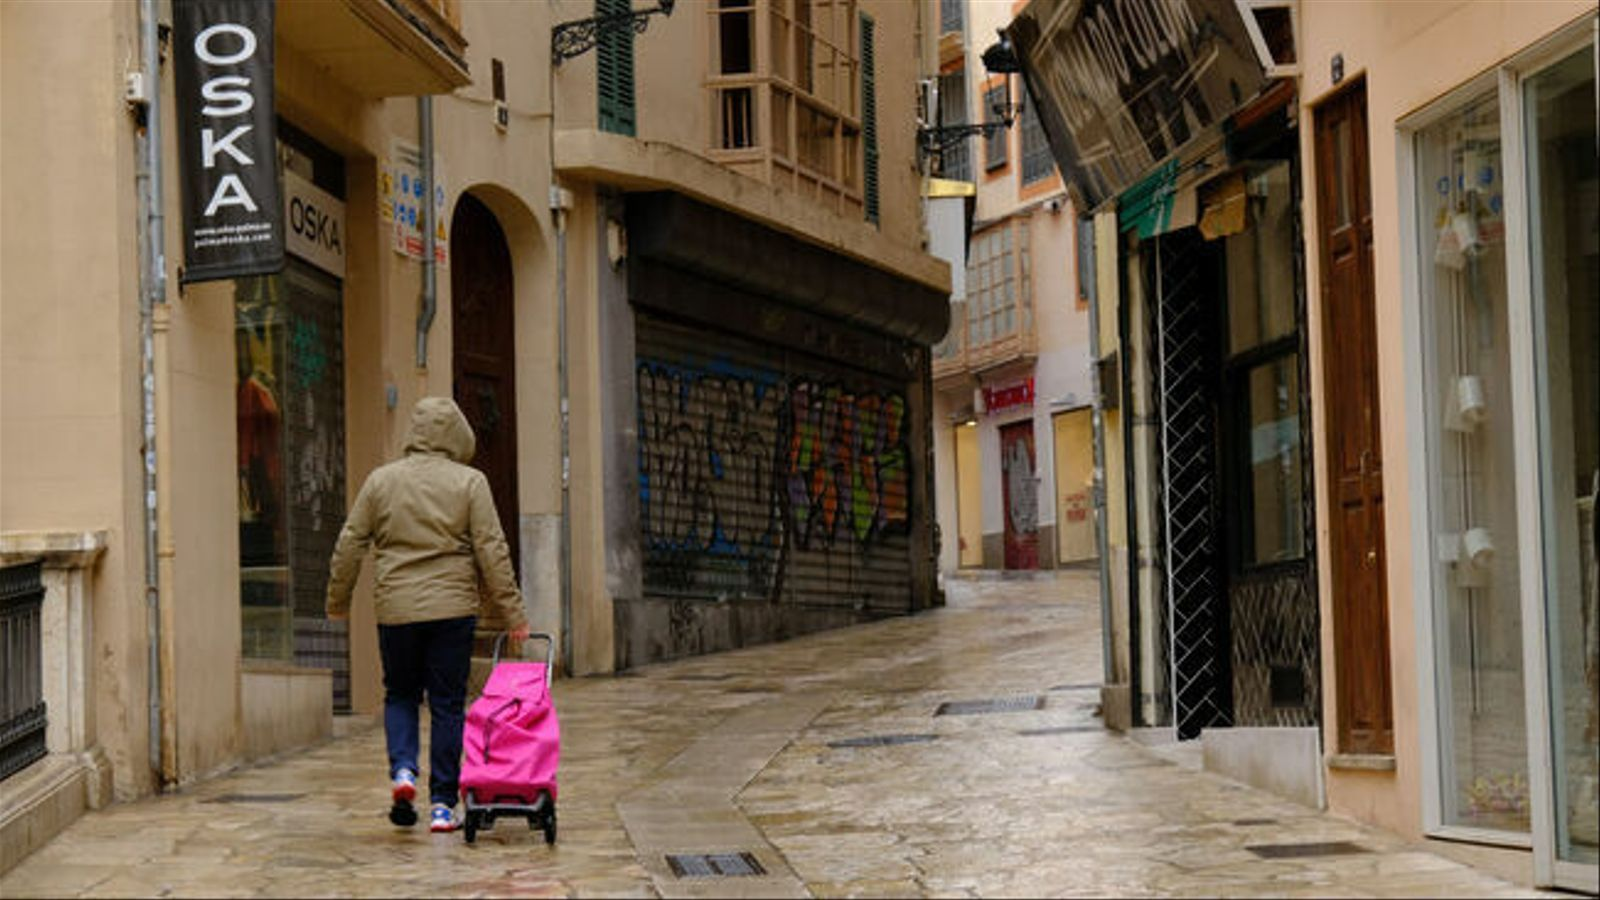 Les Balears perden 1.997 milions d'euros d'ençà que s'inicià l'estat d'alarma